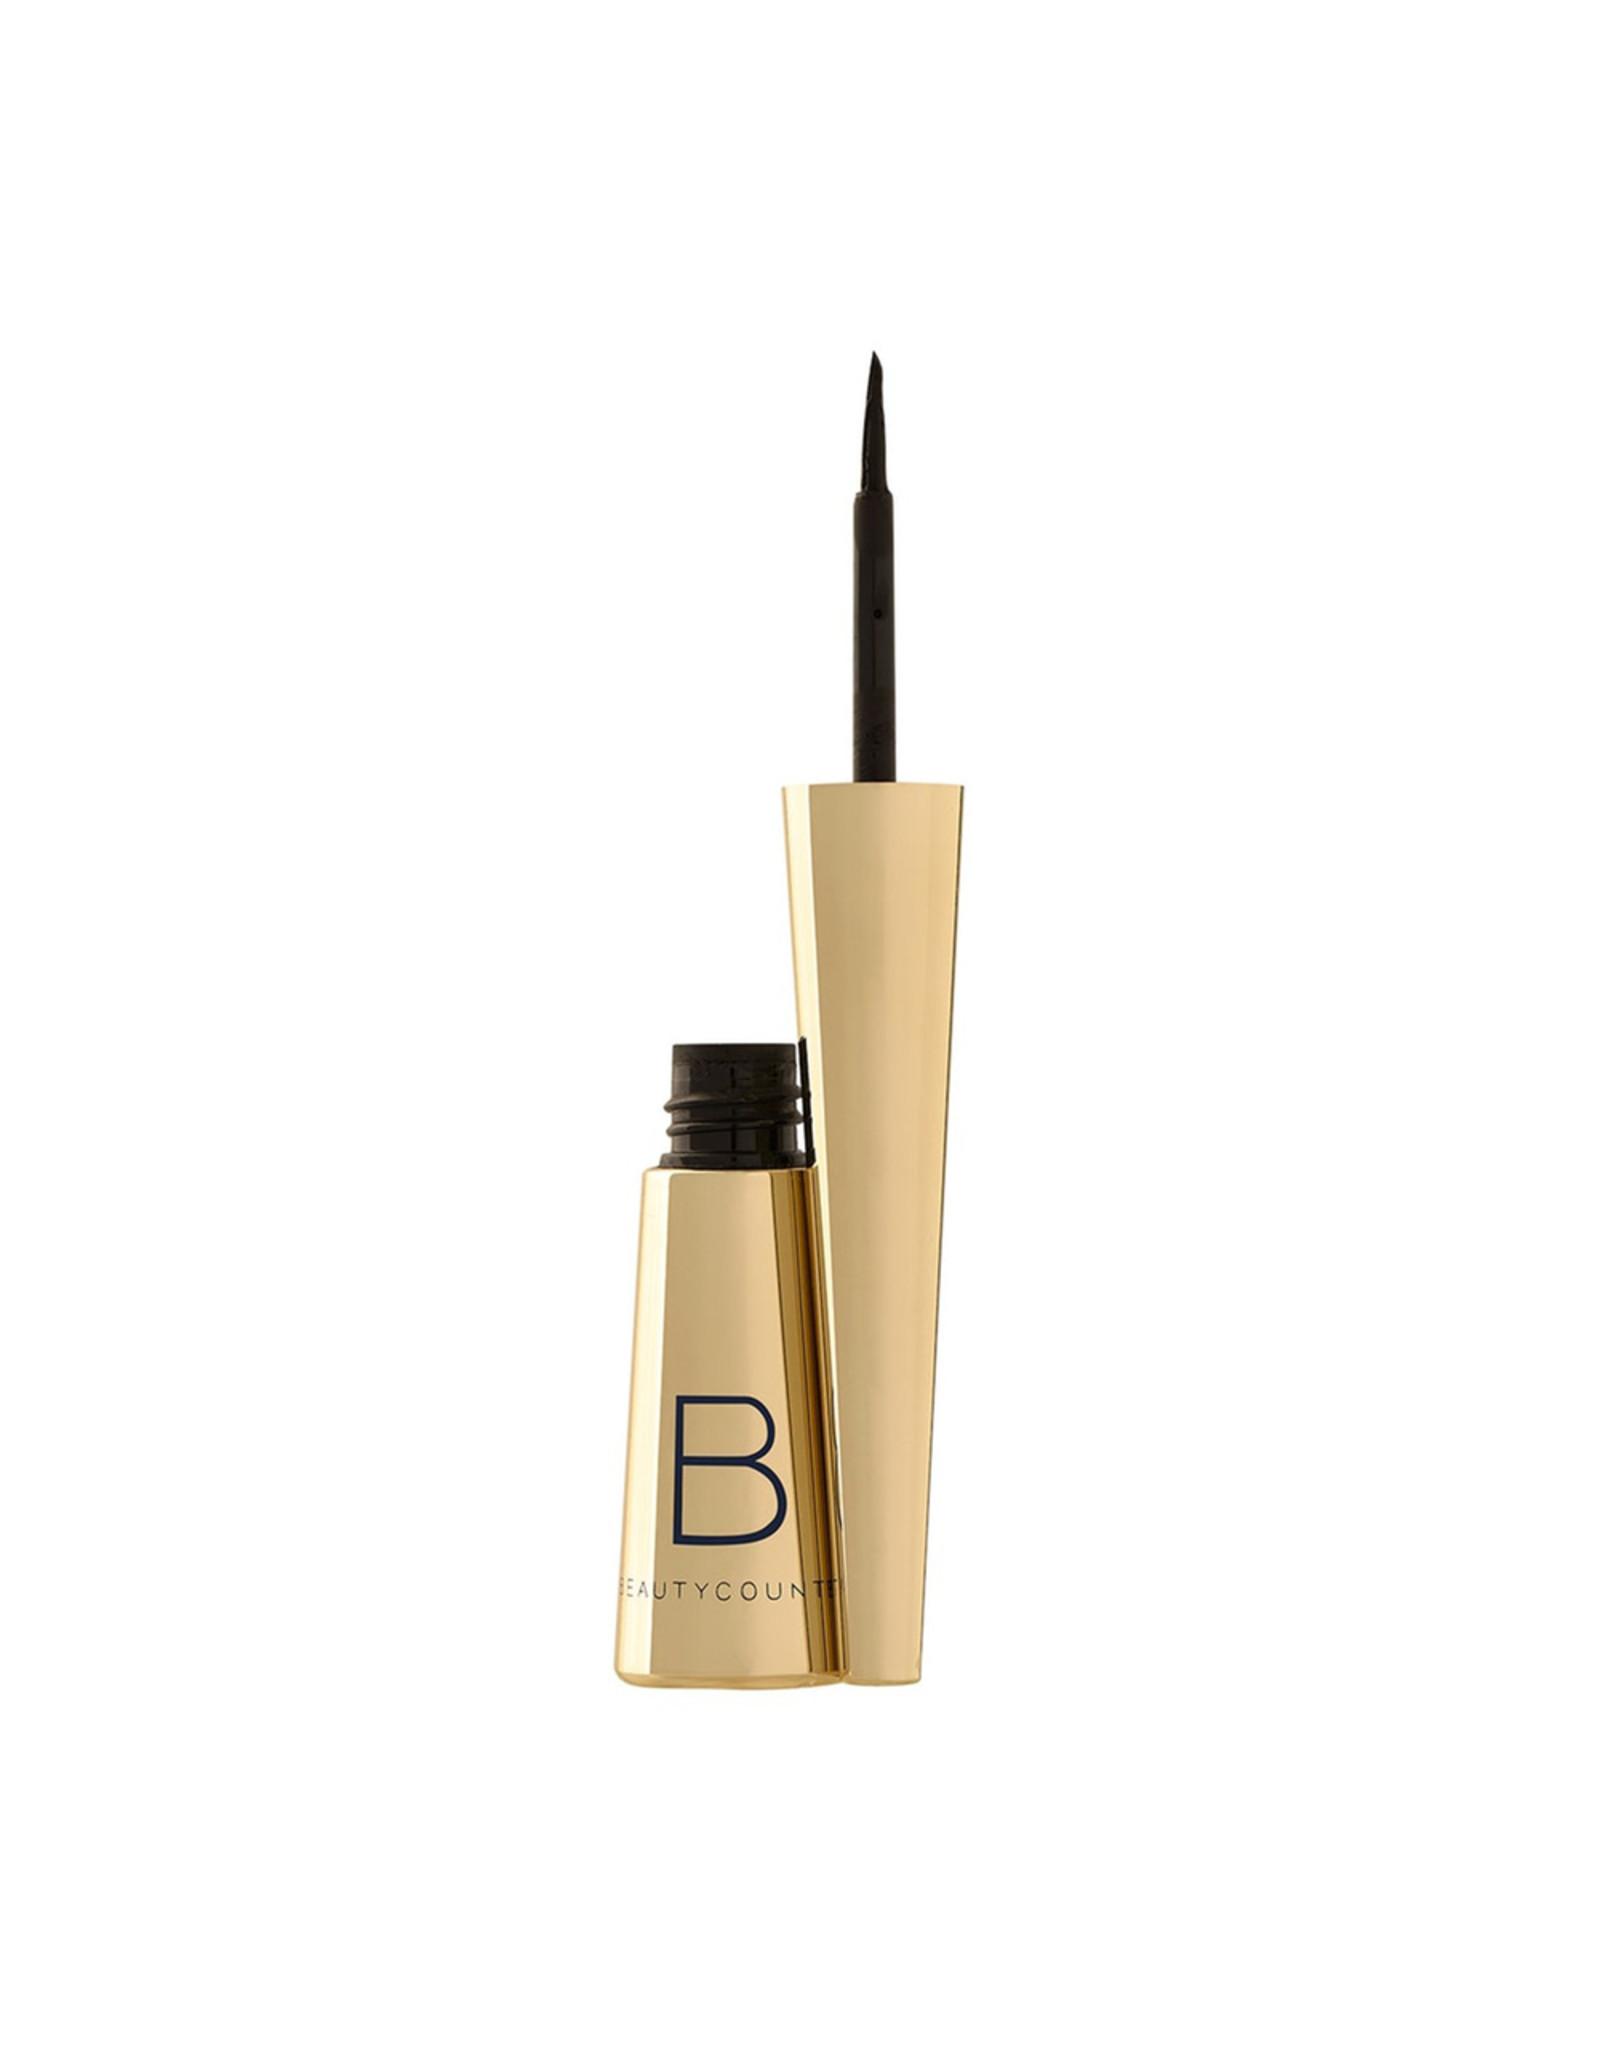 Beautycounter Beautycounter Precision Liquid Eyeliner